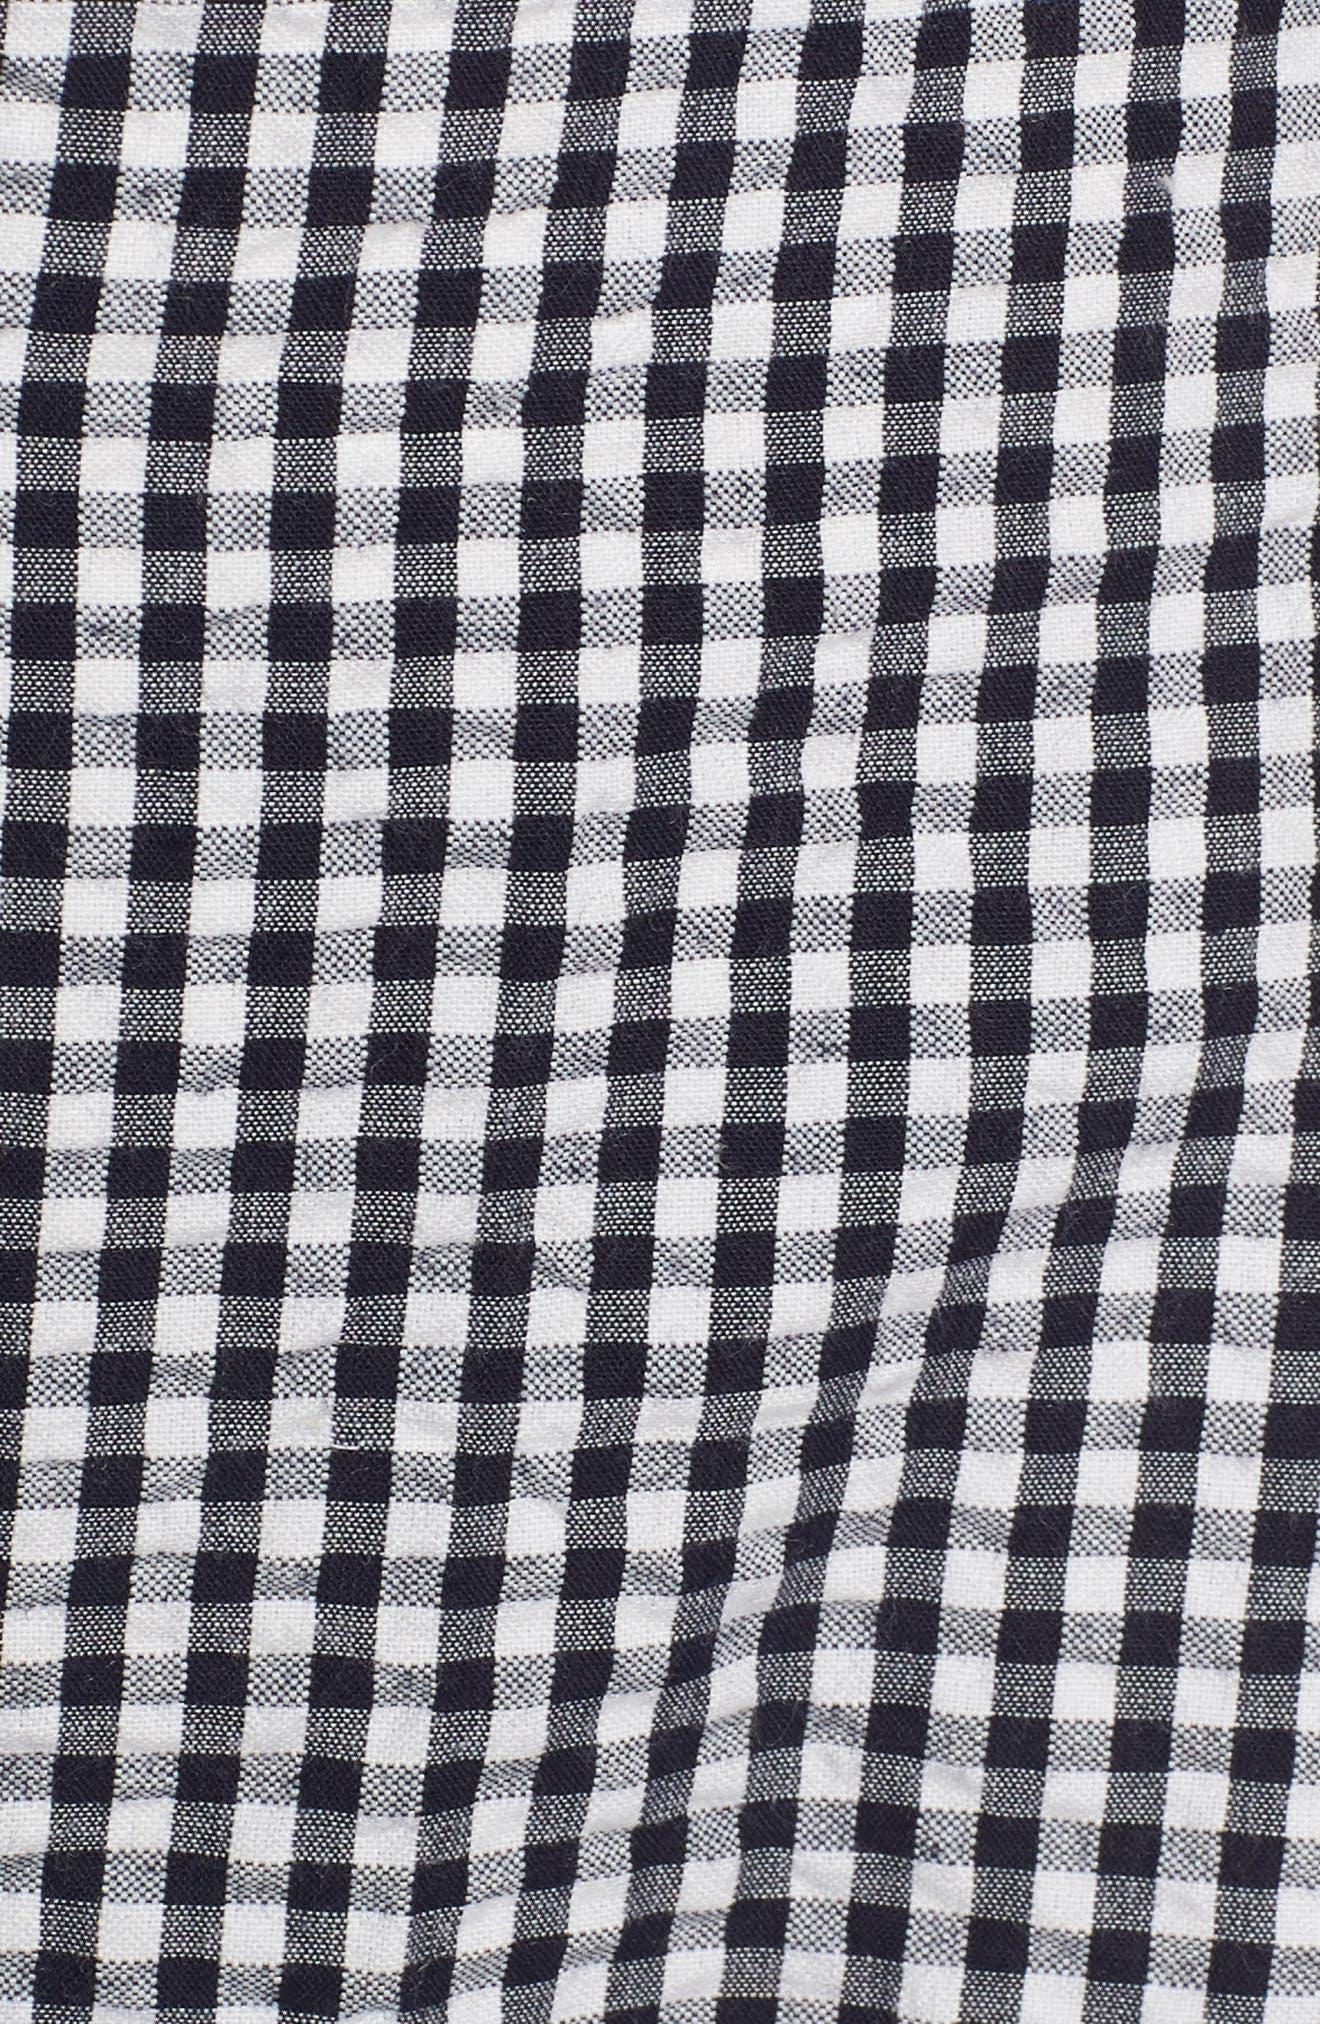 Gingham Button Front Cotton Blend Dress,                             Alternate thumbnail 6, color,                             Navy- White Gingham